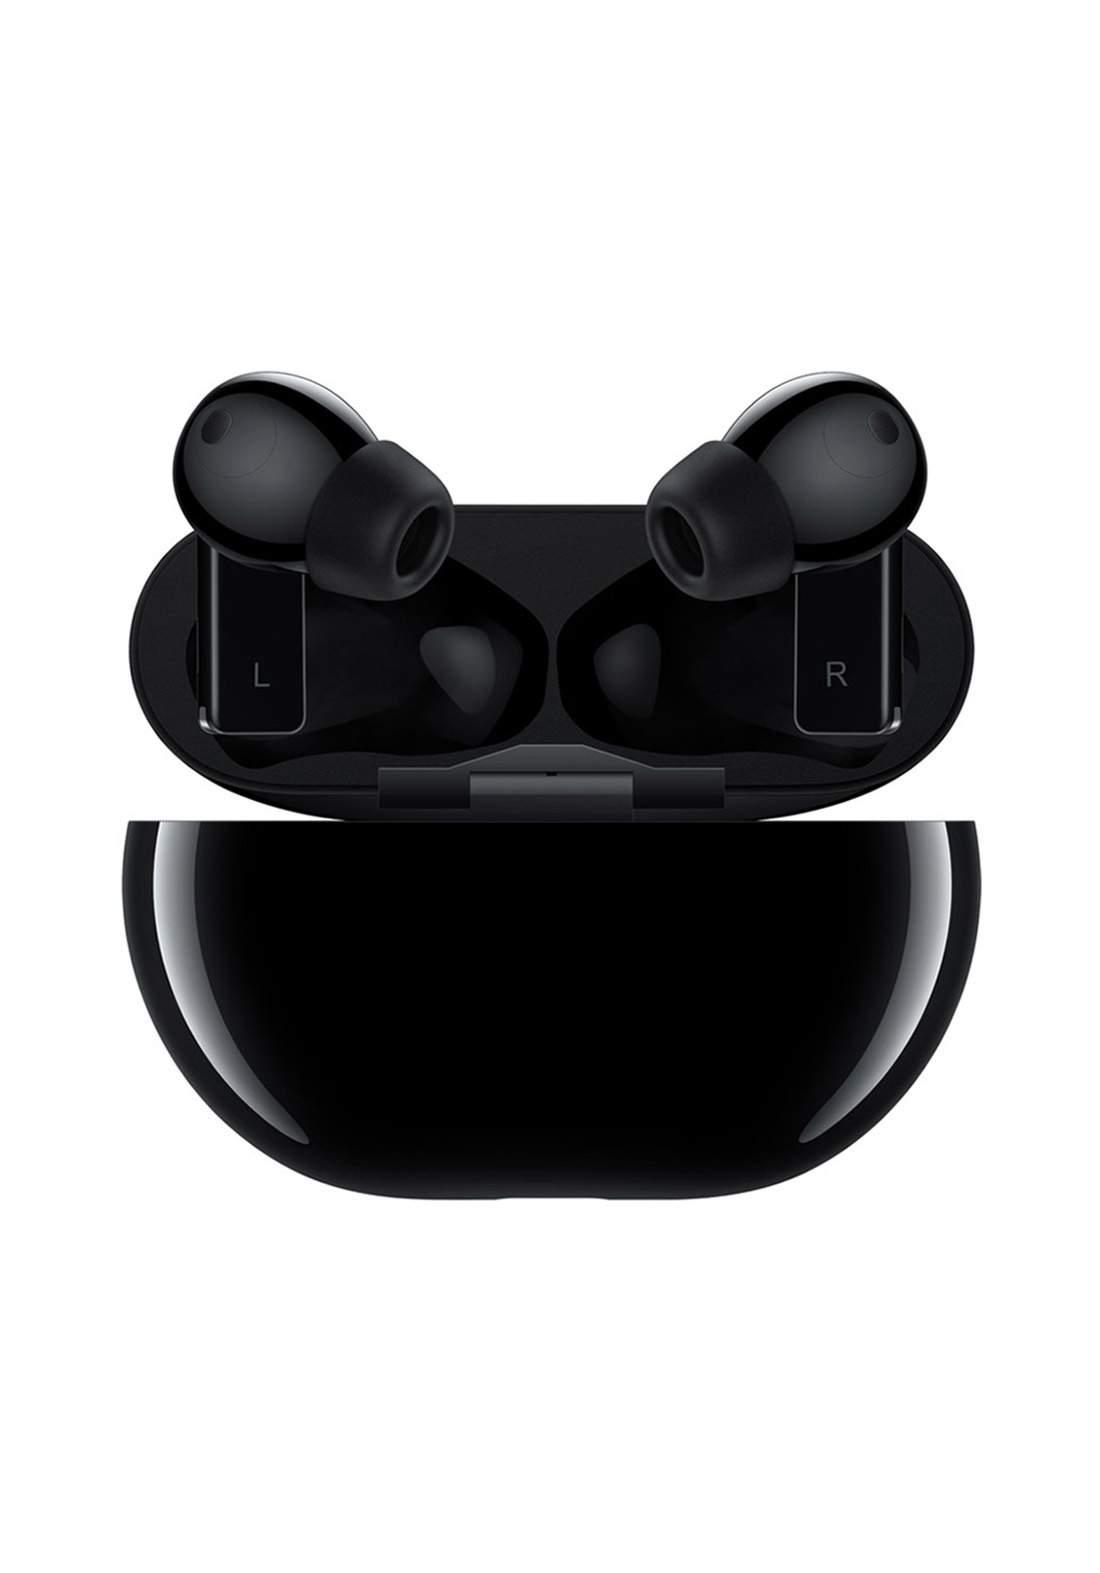 Huawei Free Buds Pro Active Noise Canceling Bluetooth Earphones -Black سماعة لاسلكية